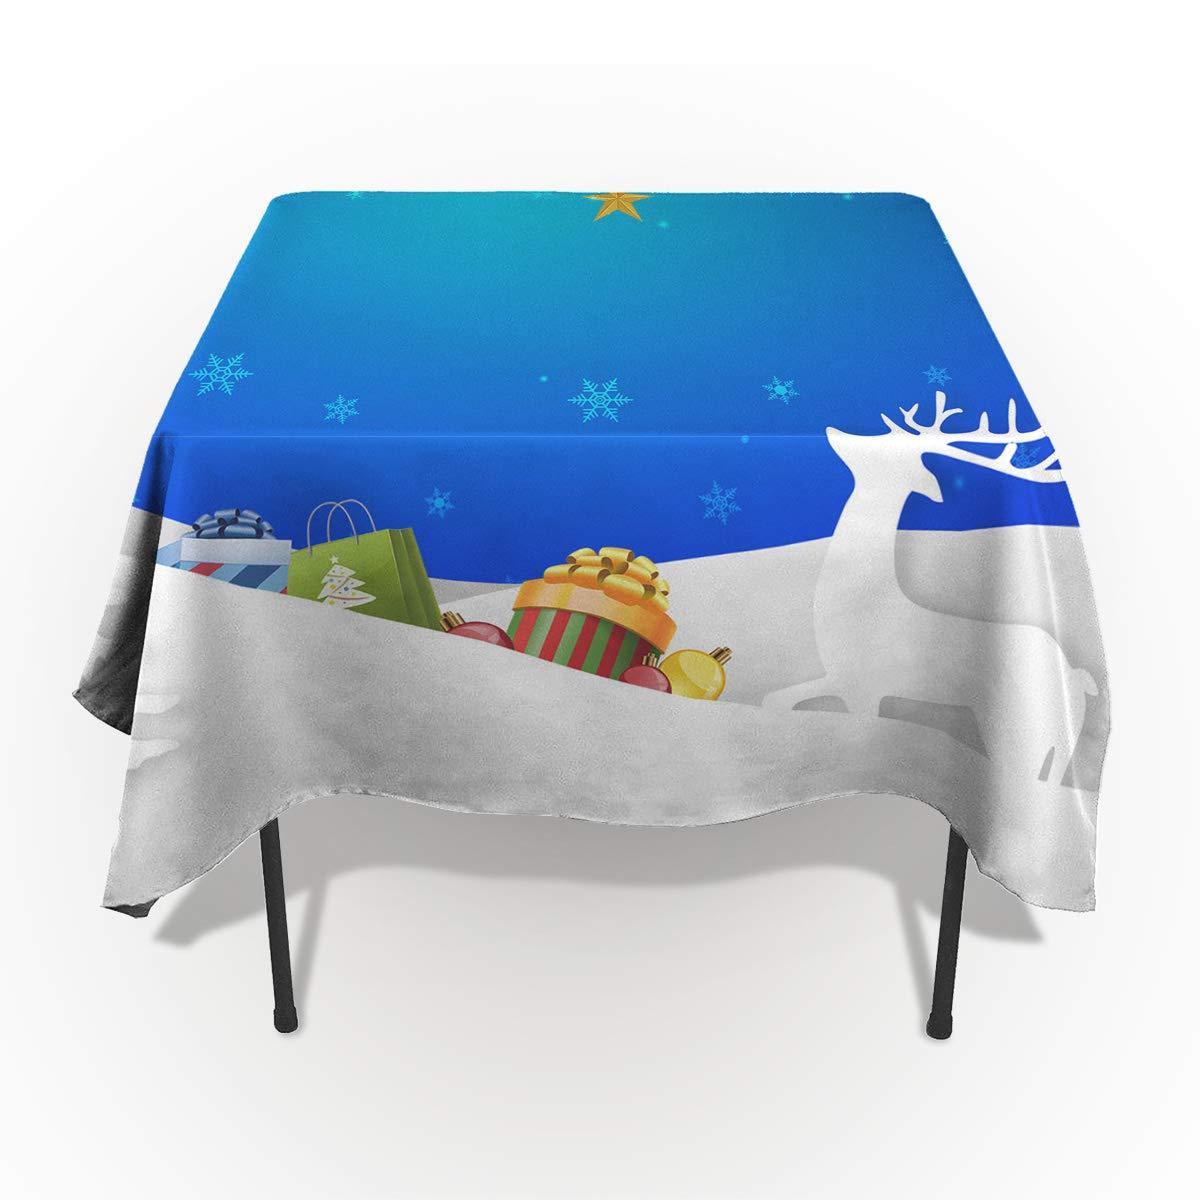 Fantasy Star 長方形ポリエステルテーブルクロス クリスマステーマ 装飾 鹿のプレゼント ベルテーブルクロス 洗濯機洗い可 テーブルカバー 装飾テーブルクロス キッチン ダイニングパーティー 60